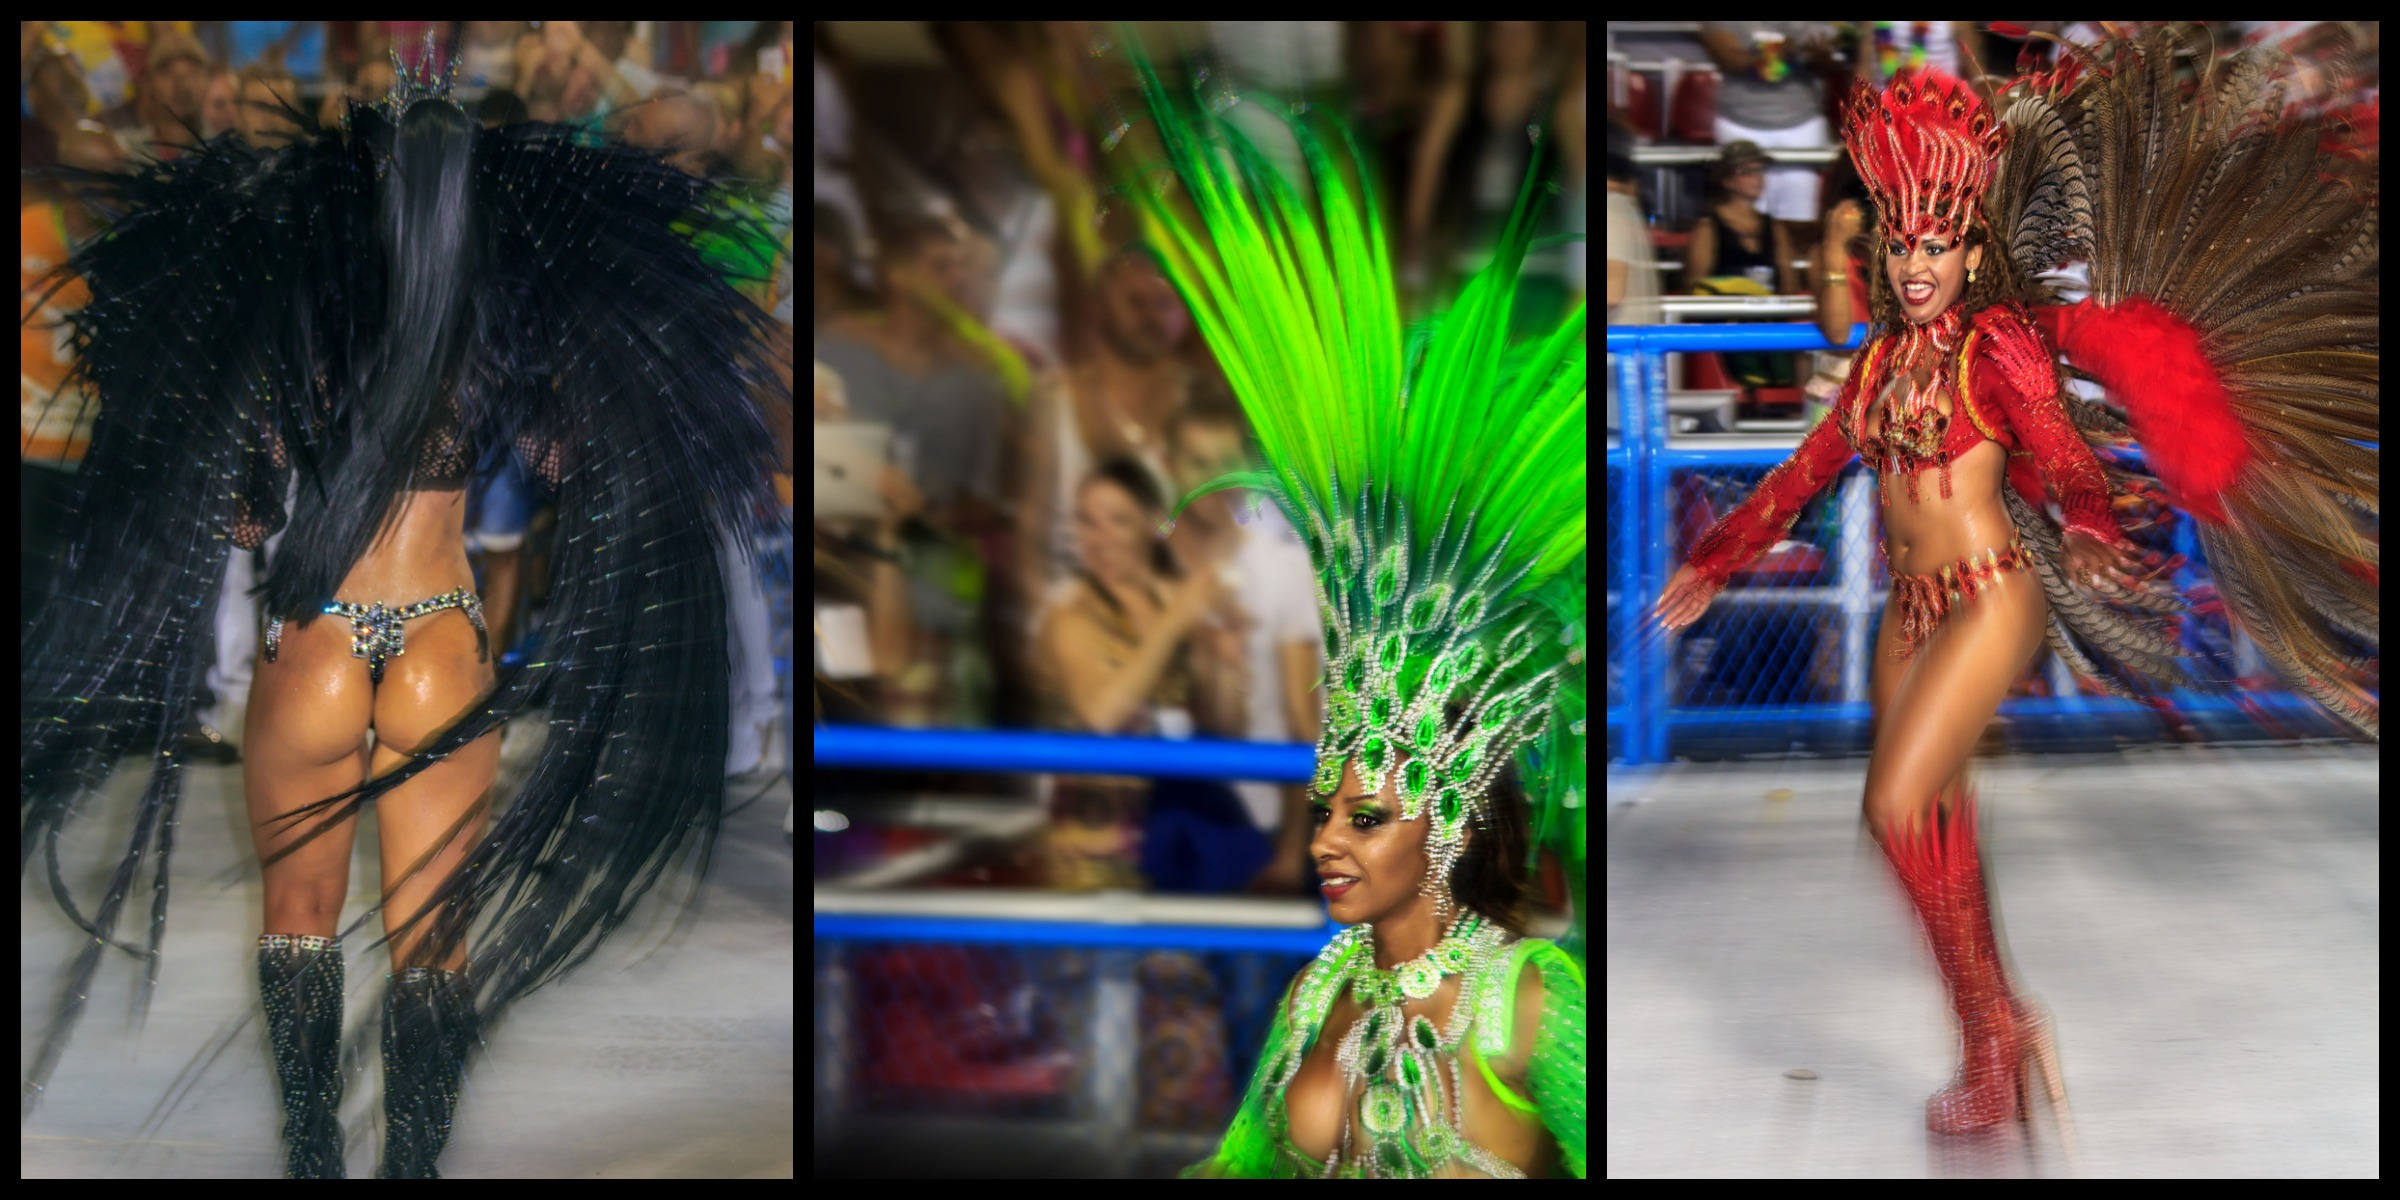 carnaval_007_inma_serrano_esparza